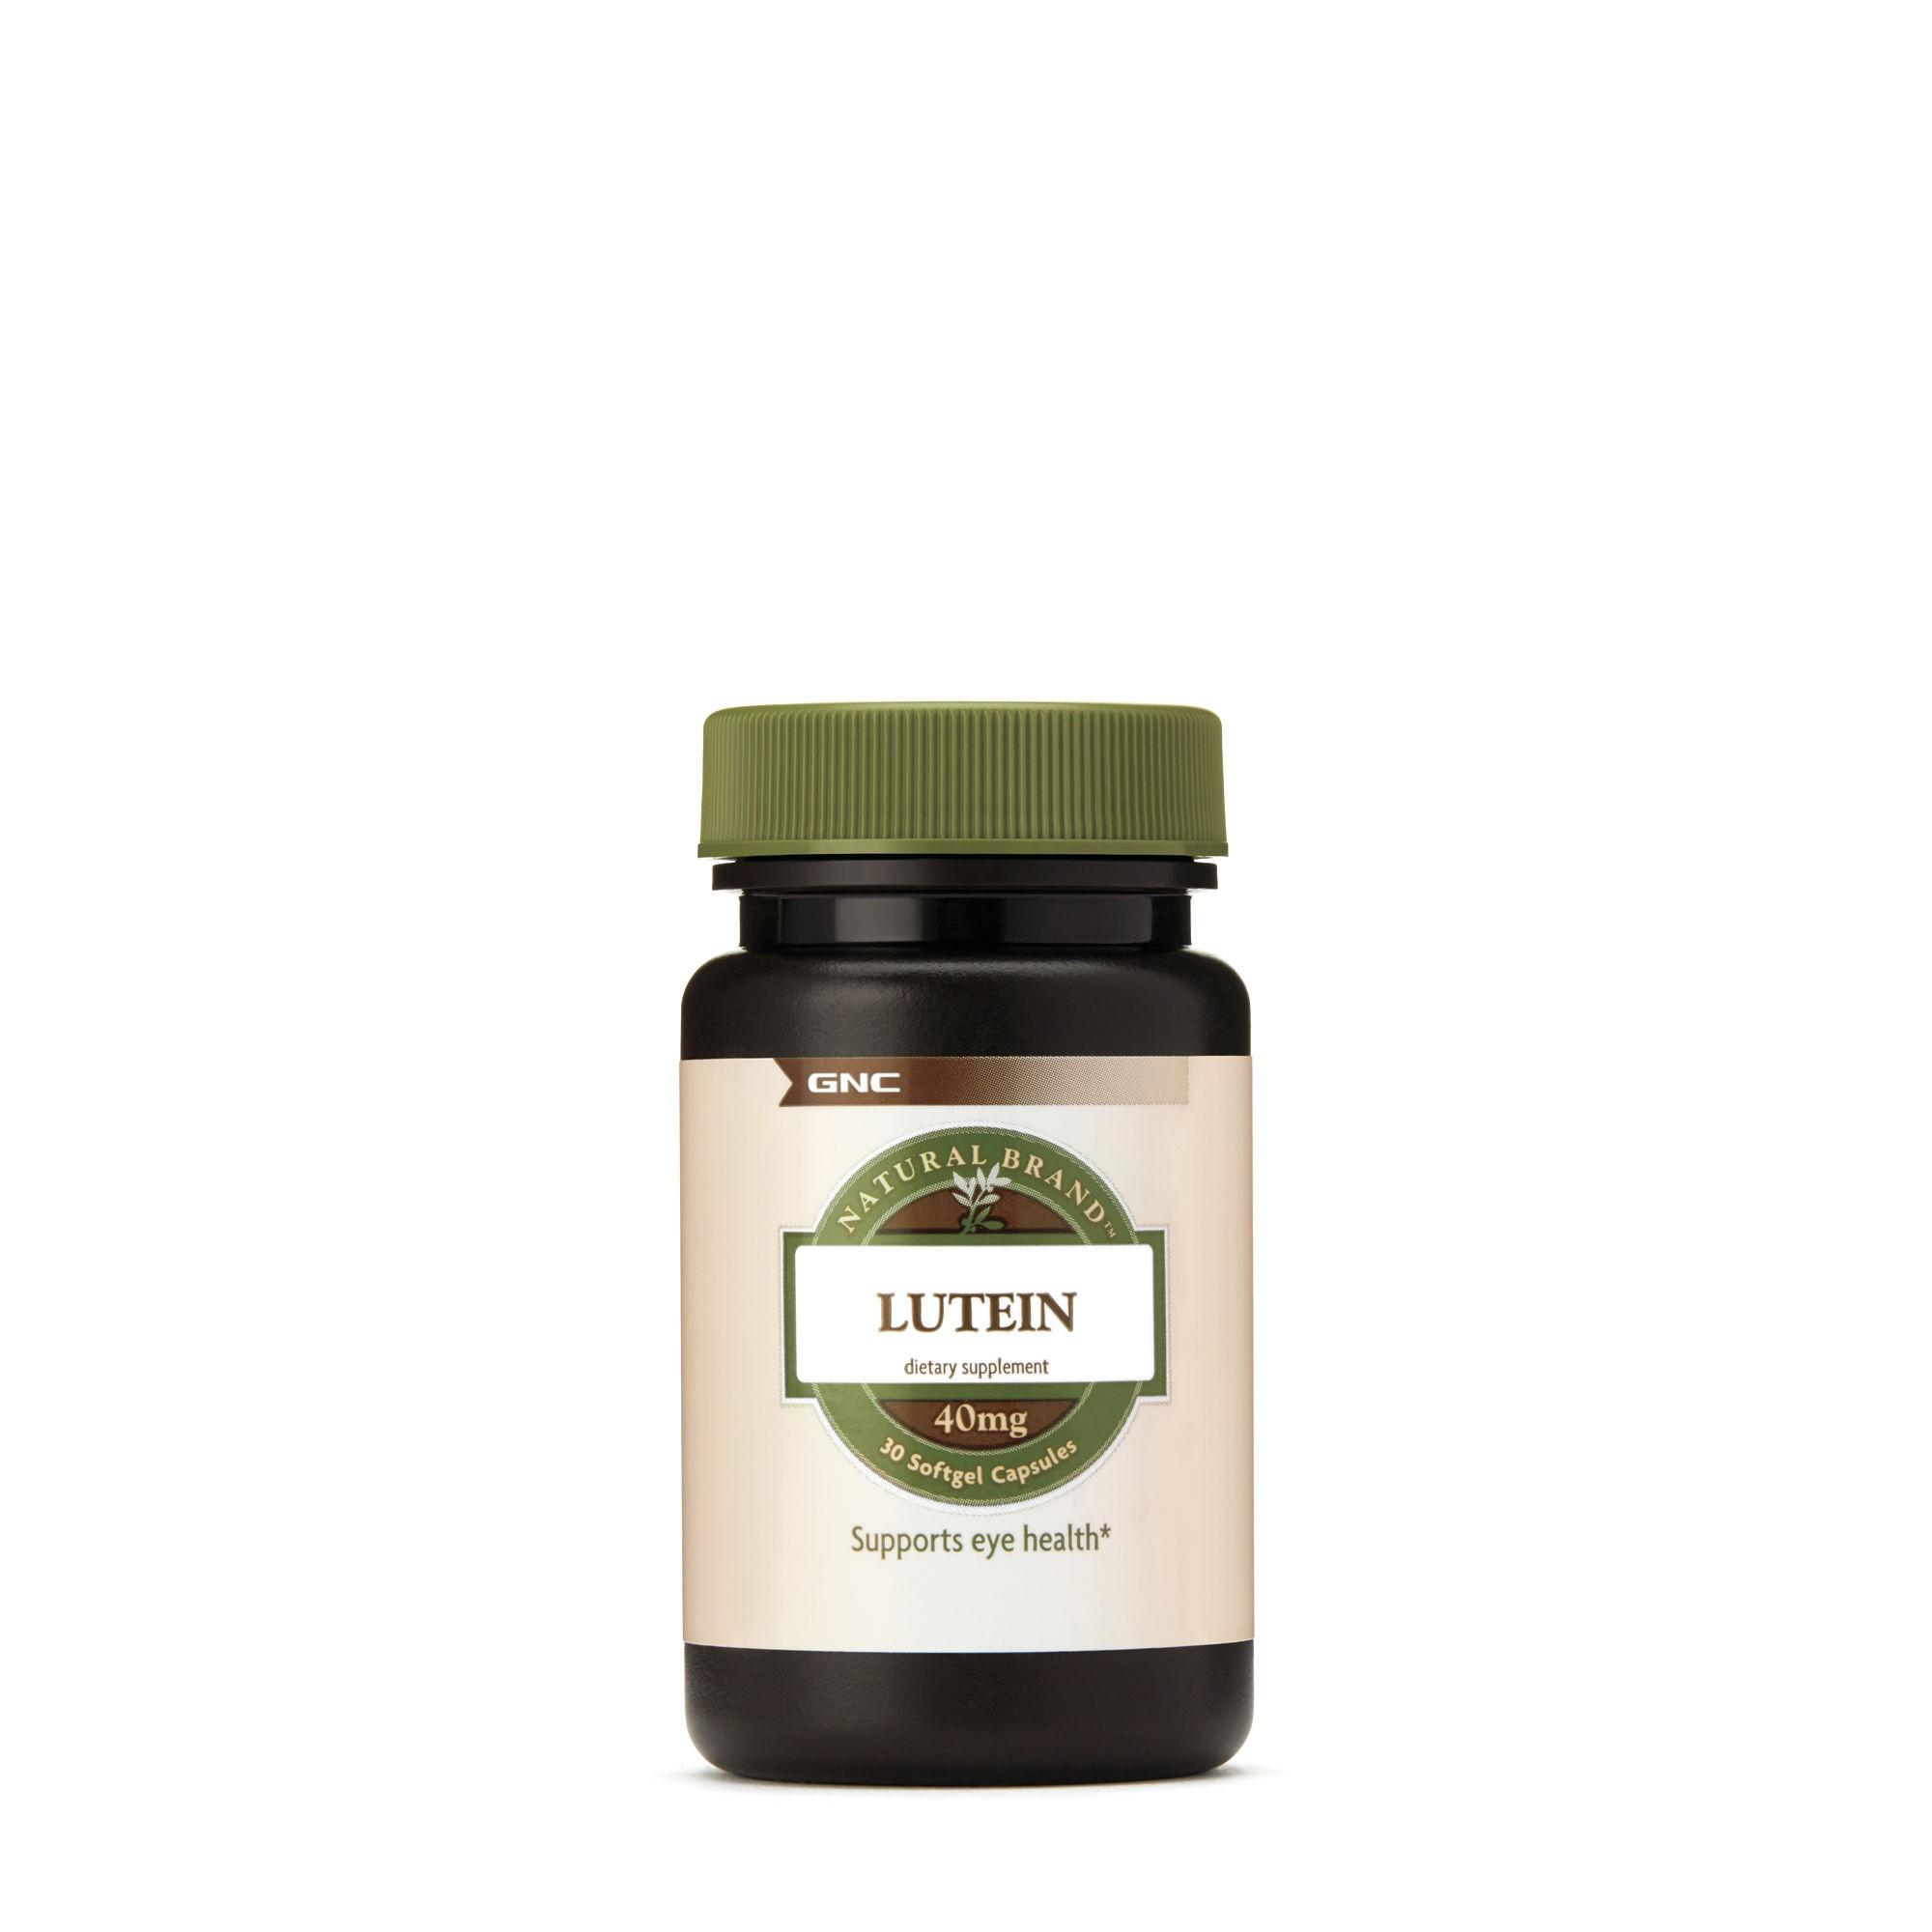 GNC Natural Brand Luteina, 40 mg